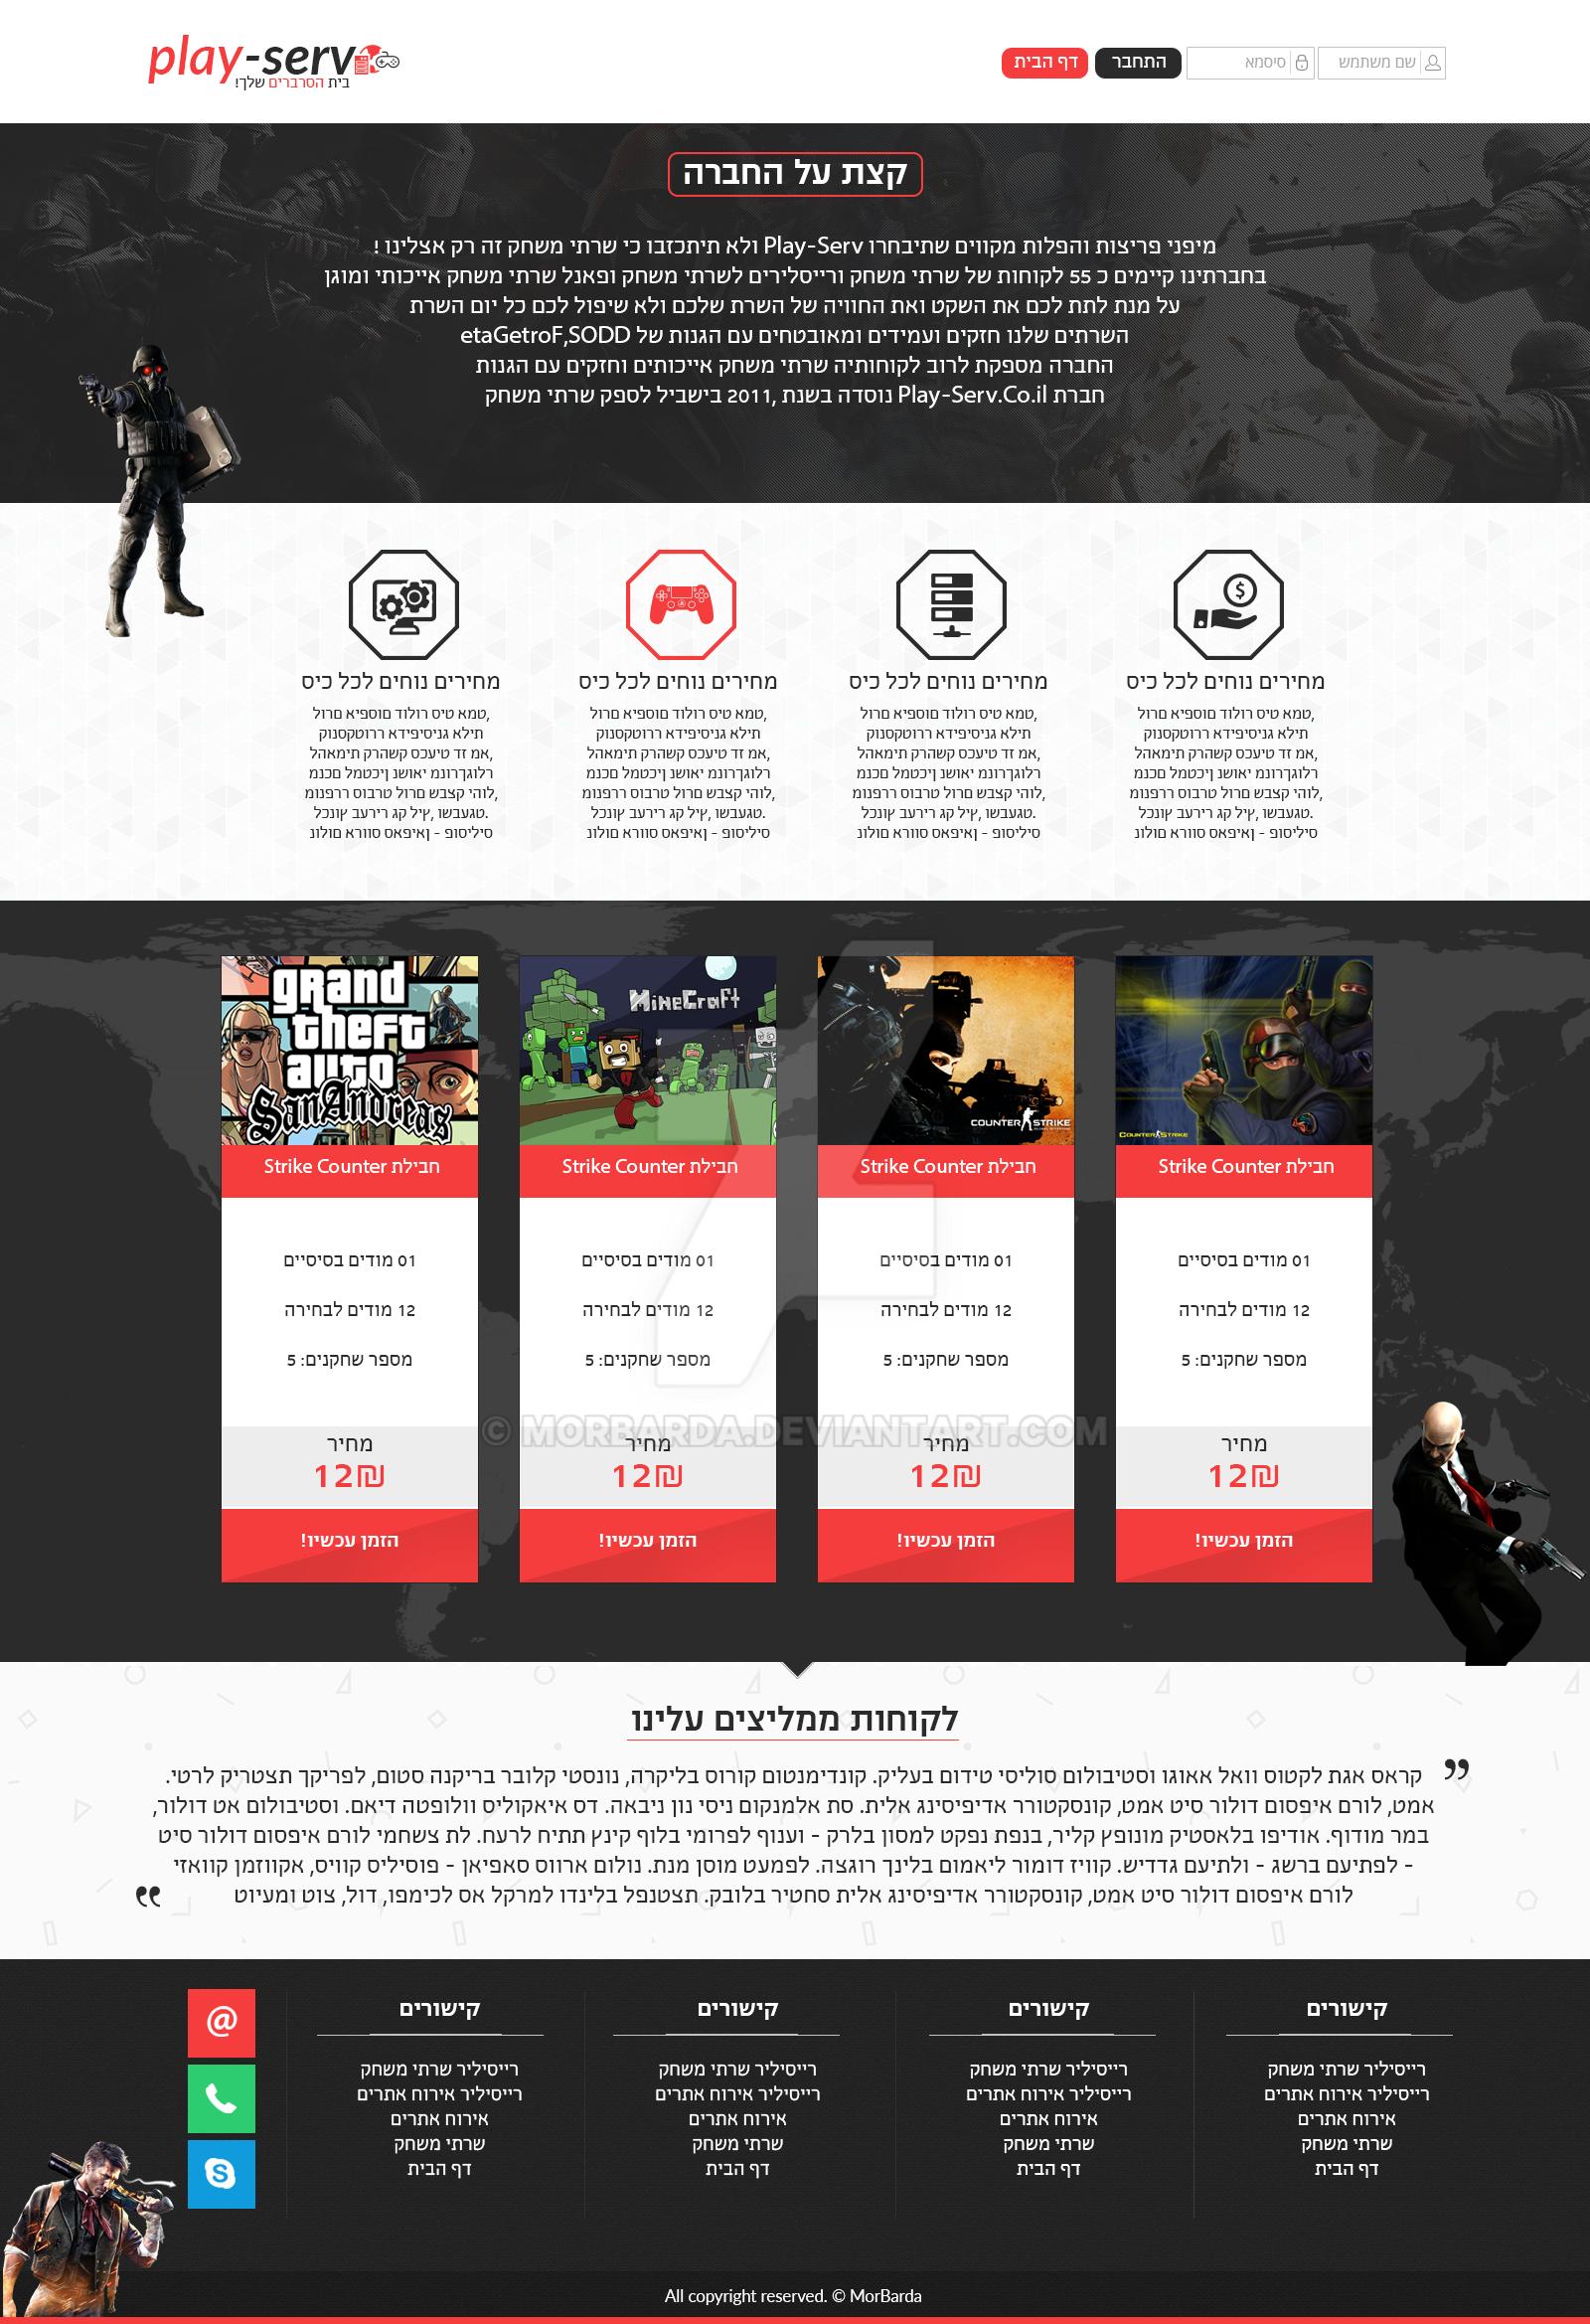 Hosting games - Play-Serv - SOLD by MorBarda